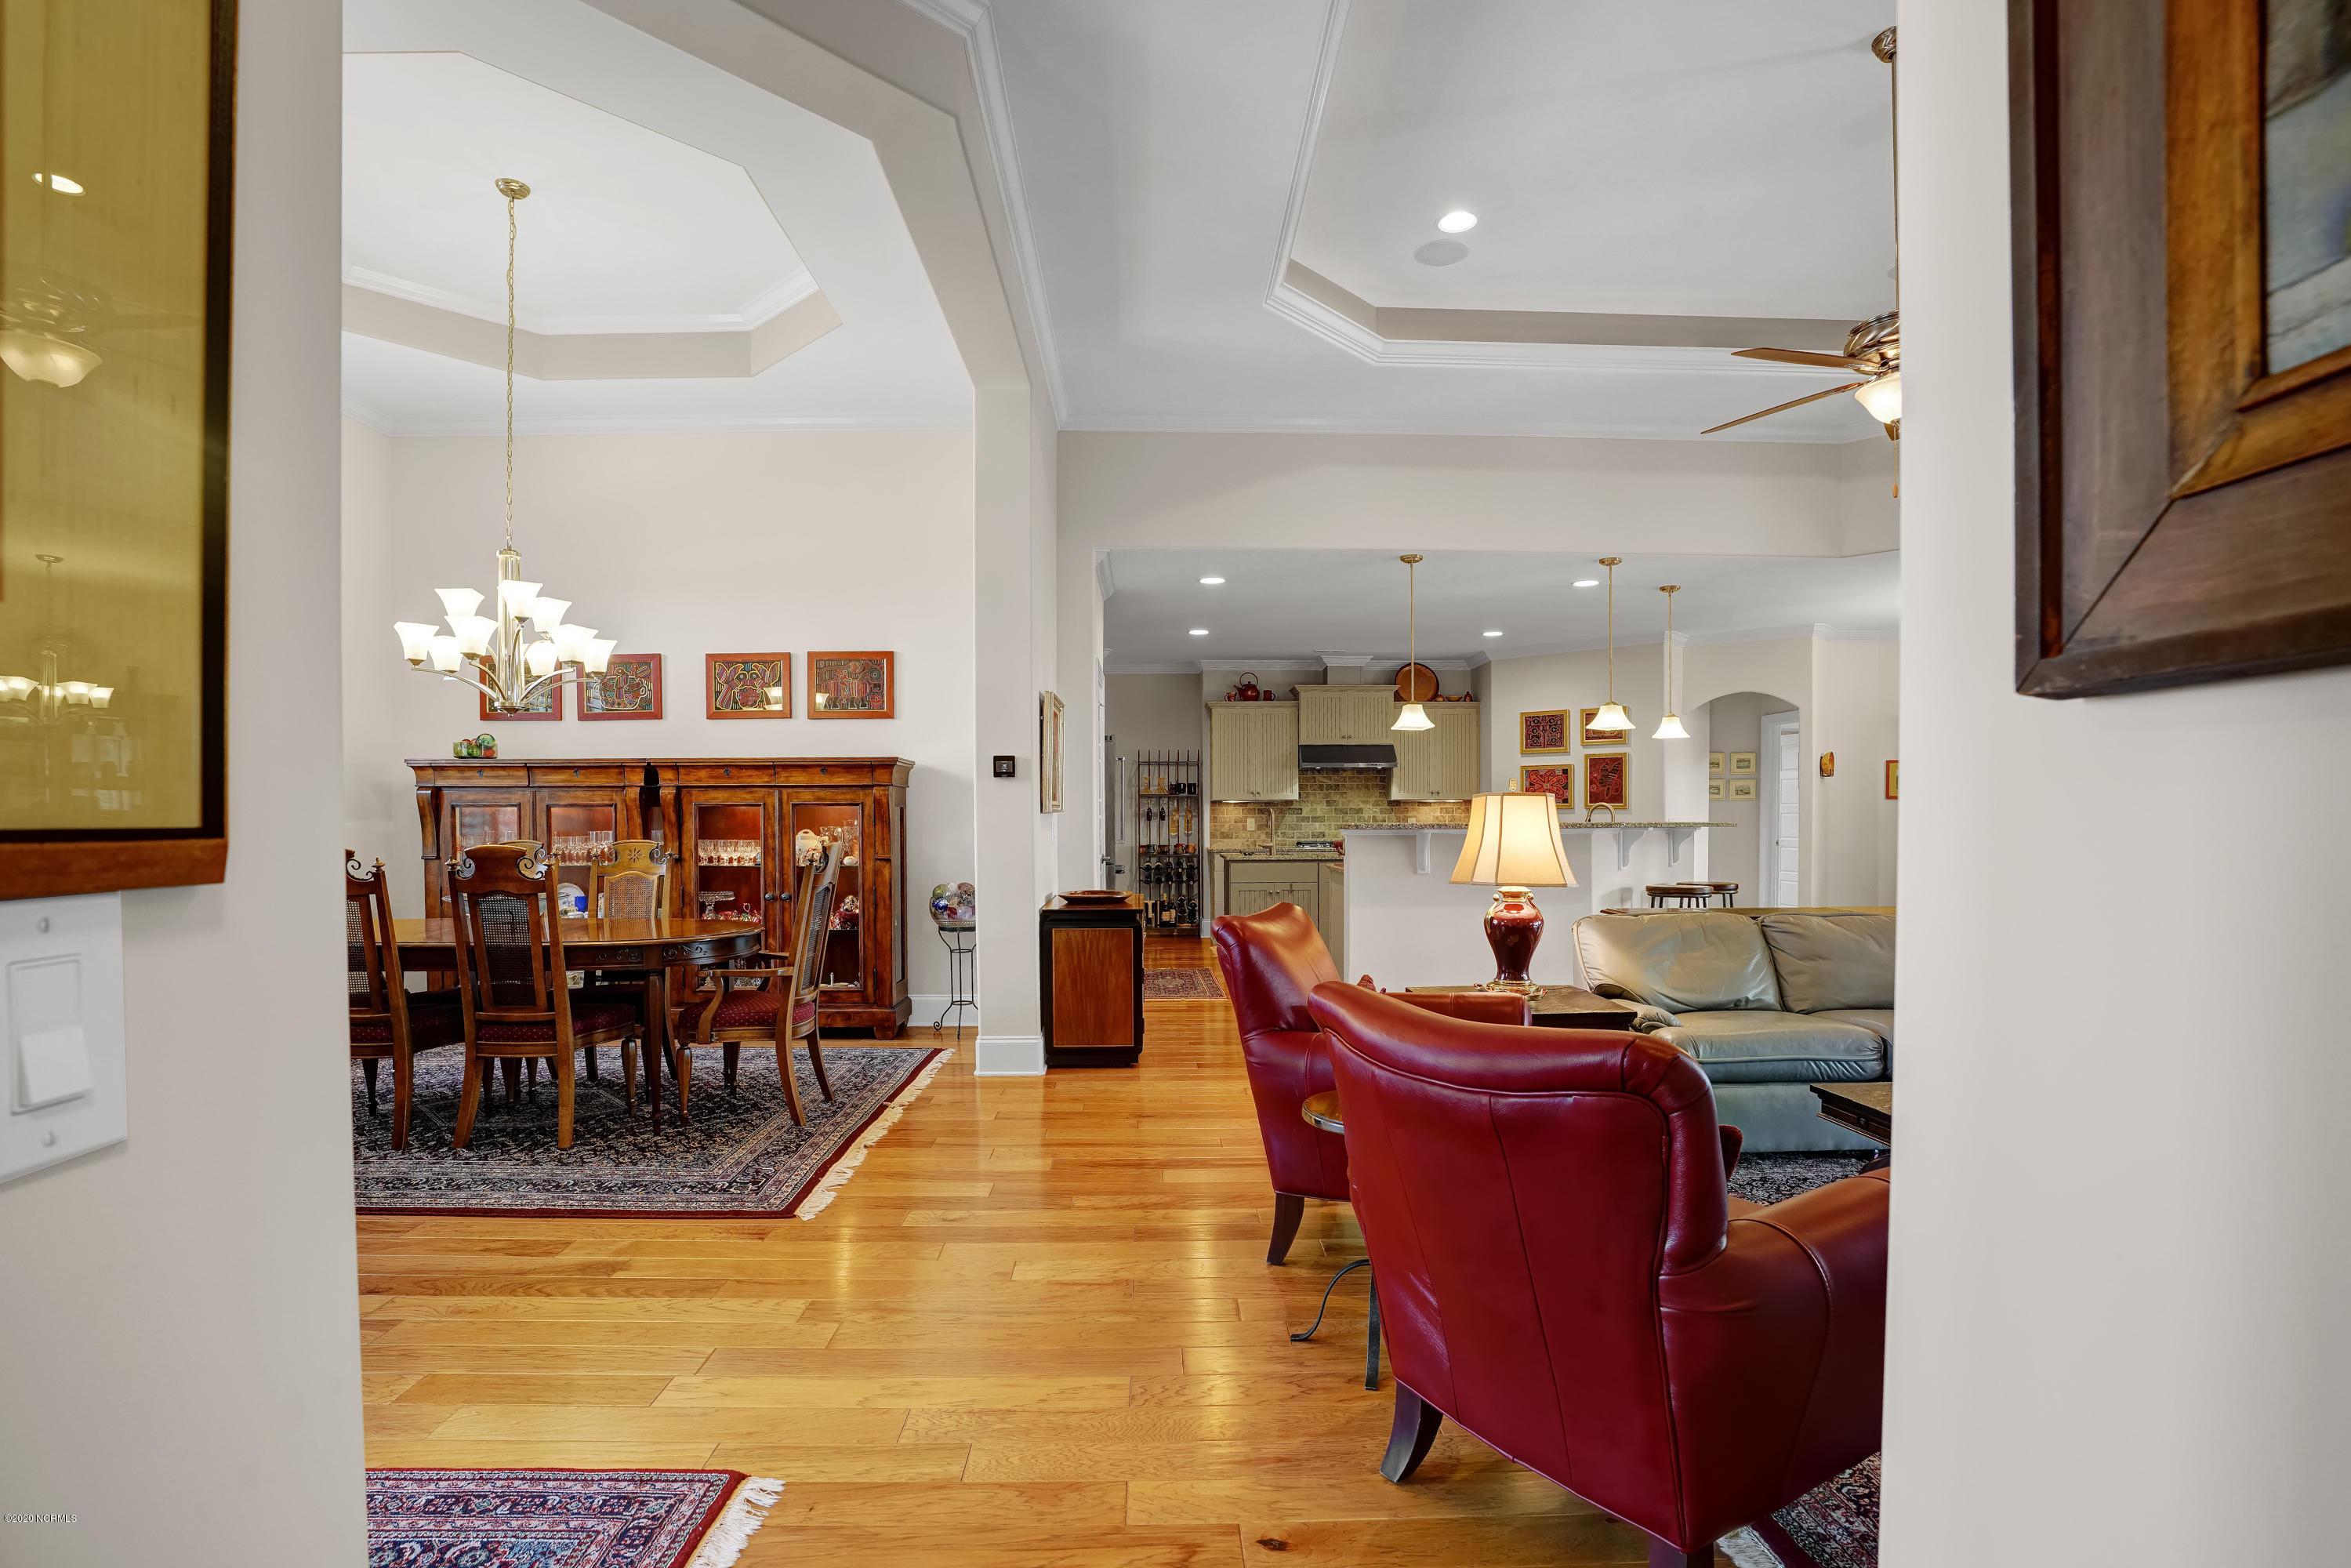 2113 Cokesbury Court, Leland, North Carolina 28451, 4 Bedrooms Bedrooms, 12 Rooms Rooms,4 BathroomsBathrooms,Single family residence,For sale,Cokesbury,100219220